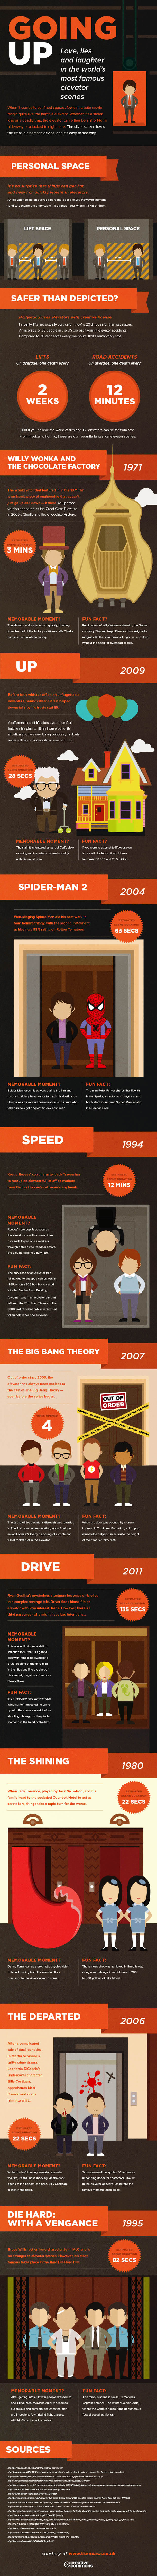 Lift infographic